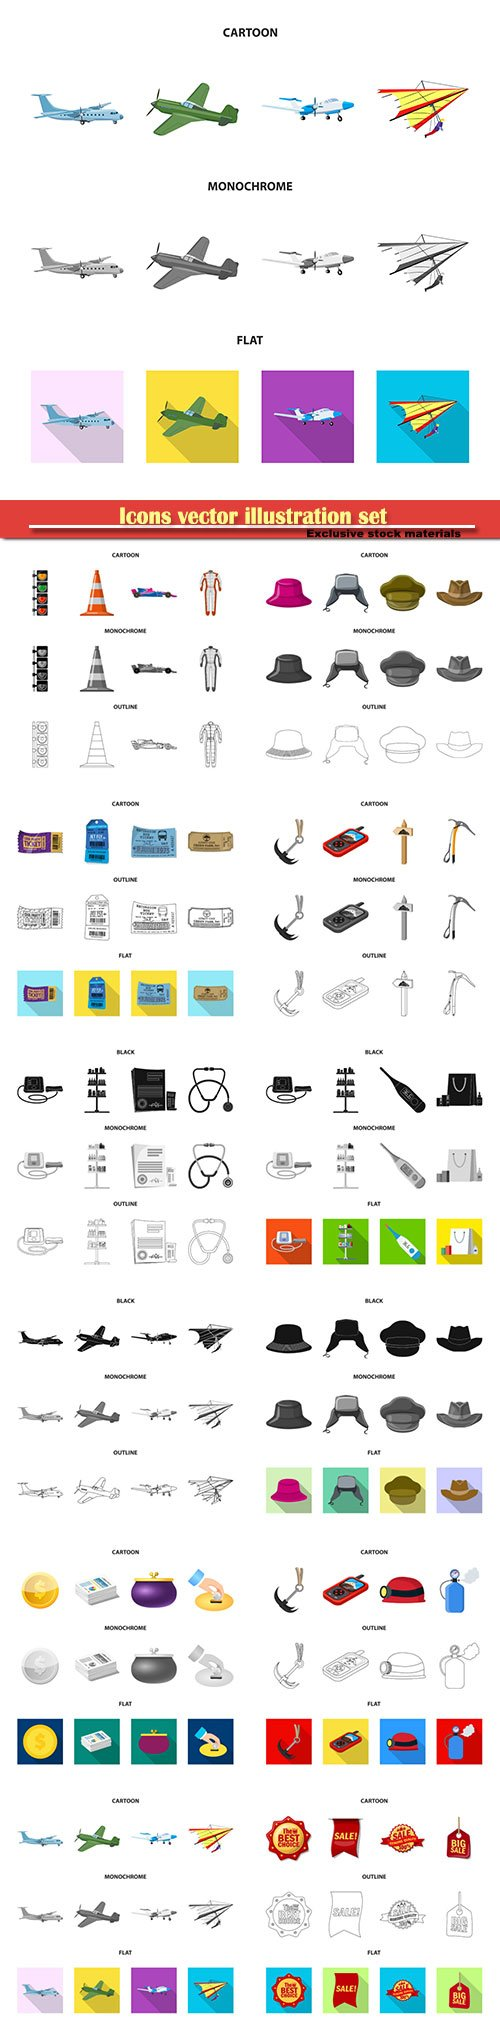 Icons vector illustration set # 7